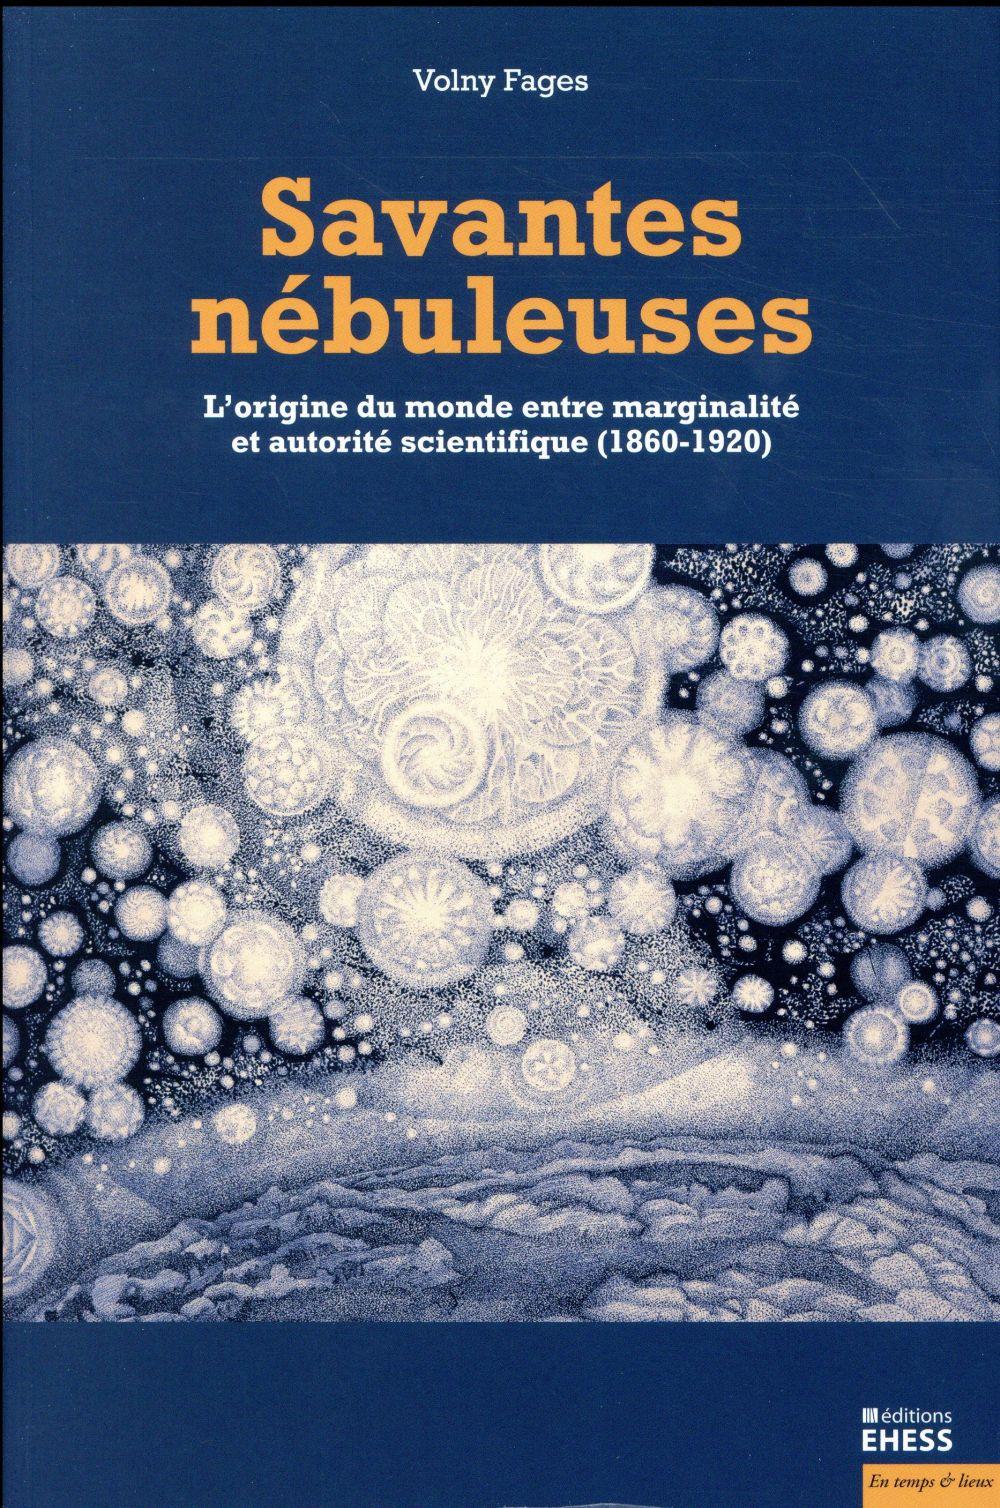 SAVANTES NEBULEUSES - L ORIGINE DU MONDE ENTRE MARGINALITE ET AUTORITE SCIENTIFIQUE (1860-1920)